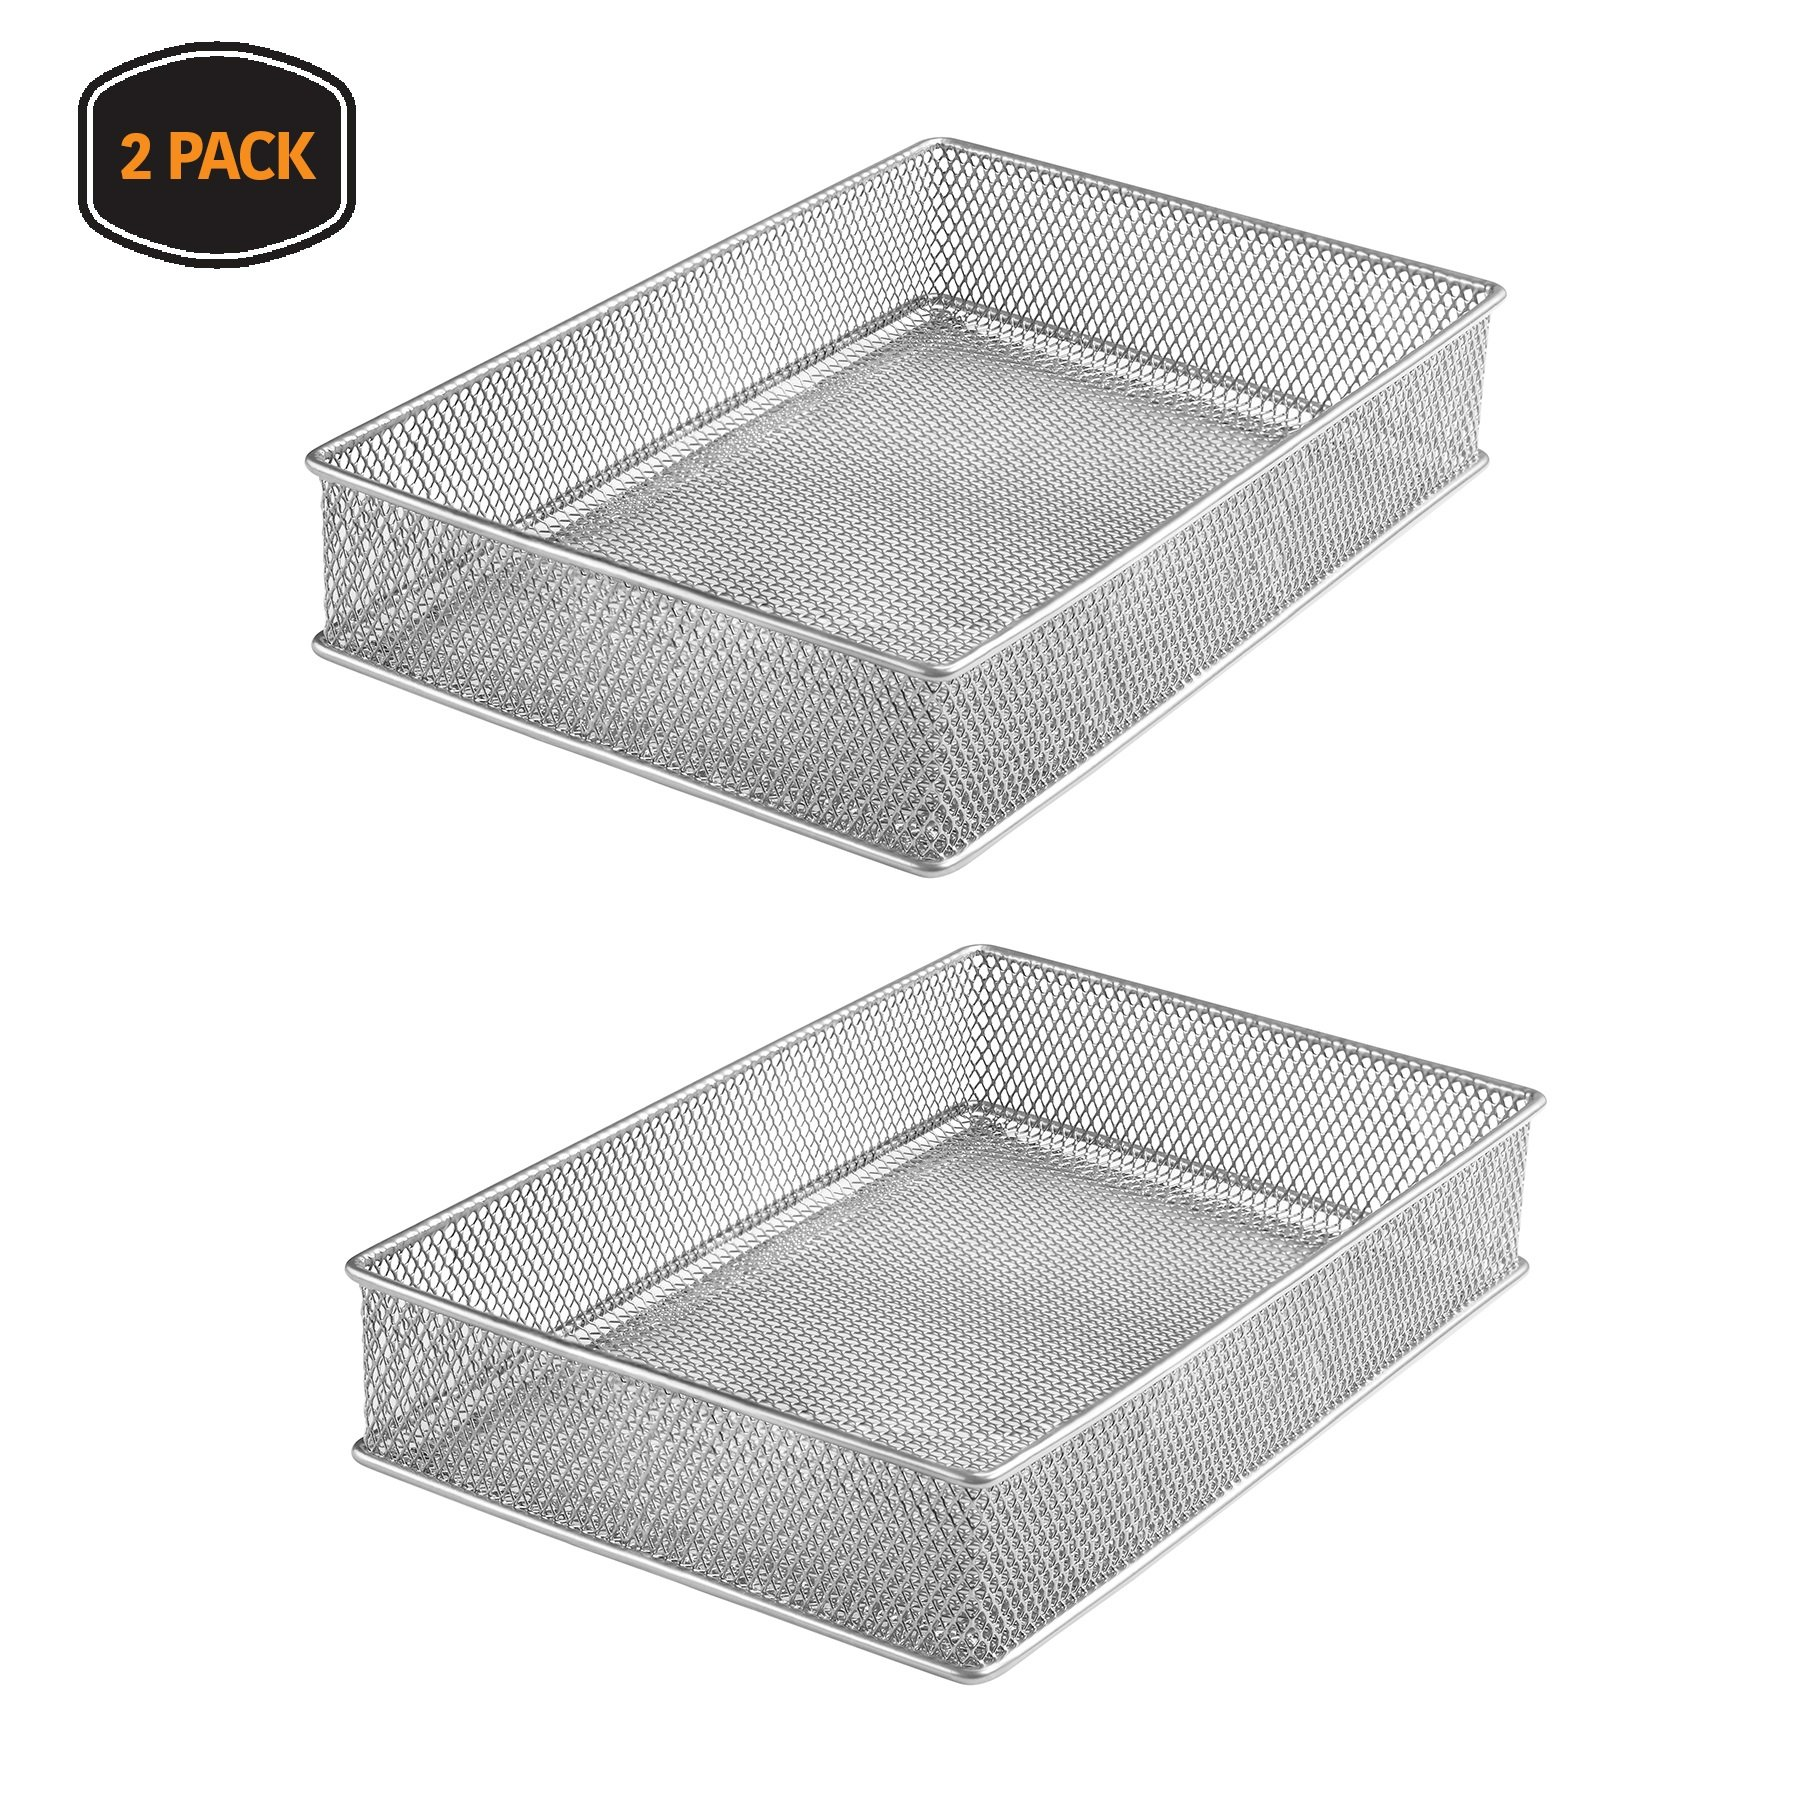 Ybm Home Silver Mesh Drawer Cabinet and or Shelf Organizer Bins, School Supply Holder Office Desktop Organizer Basket 1590s-2 (2, 6x9x2 Inch)